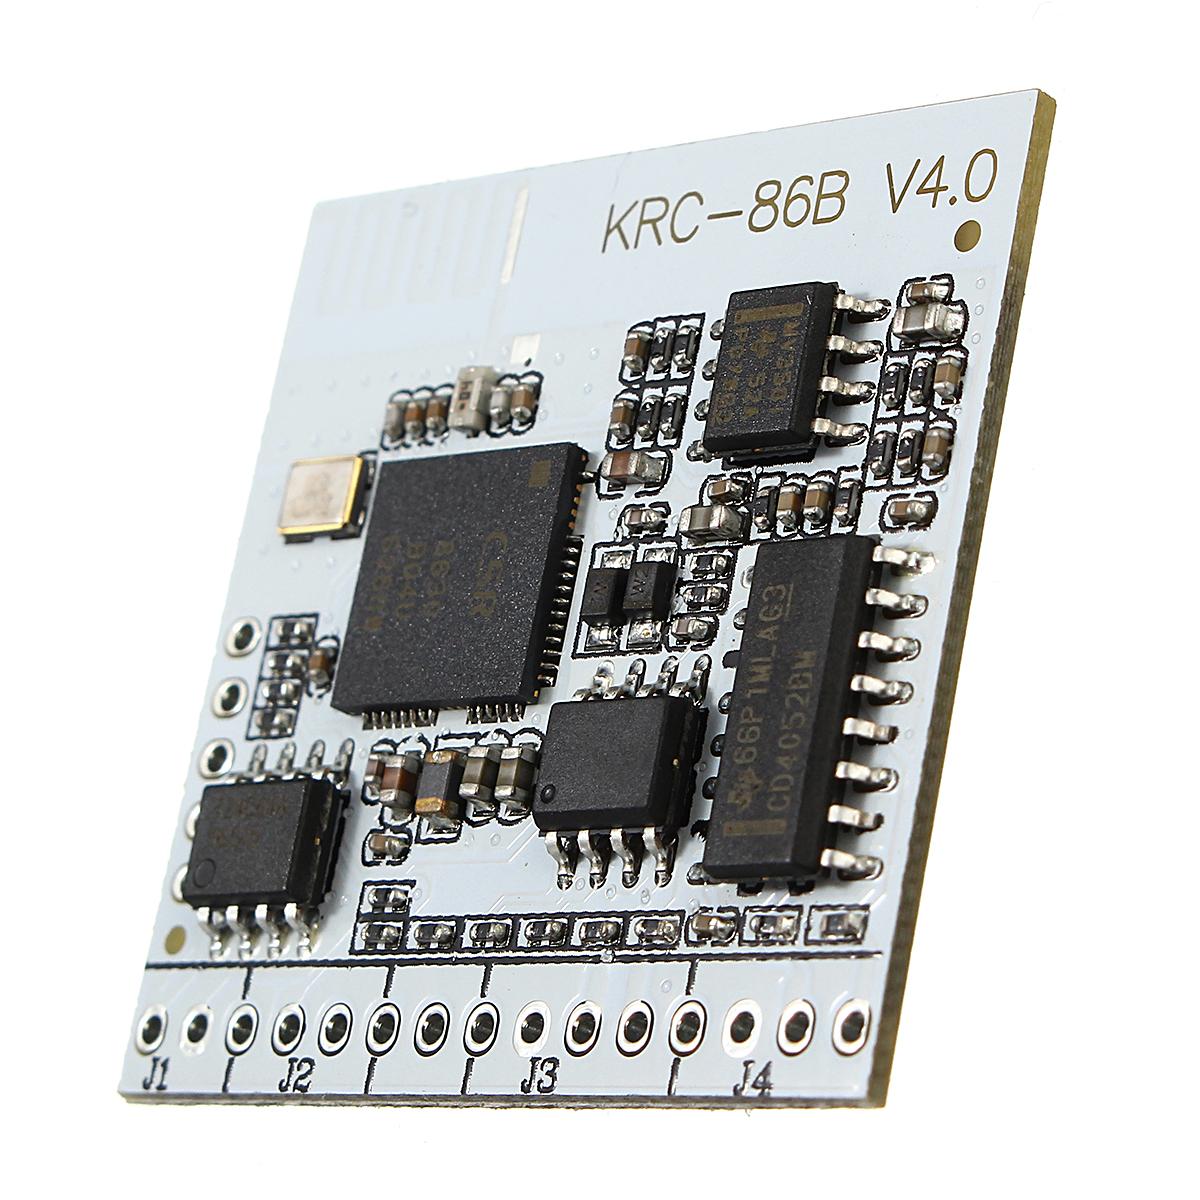 1 x KRC-86B Bluetooth 4.0 Stereo Audio Receiver Module Board